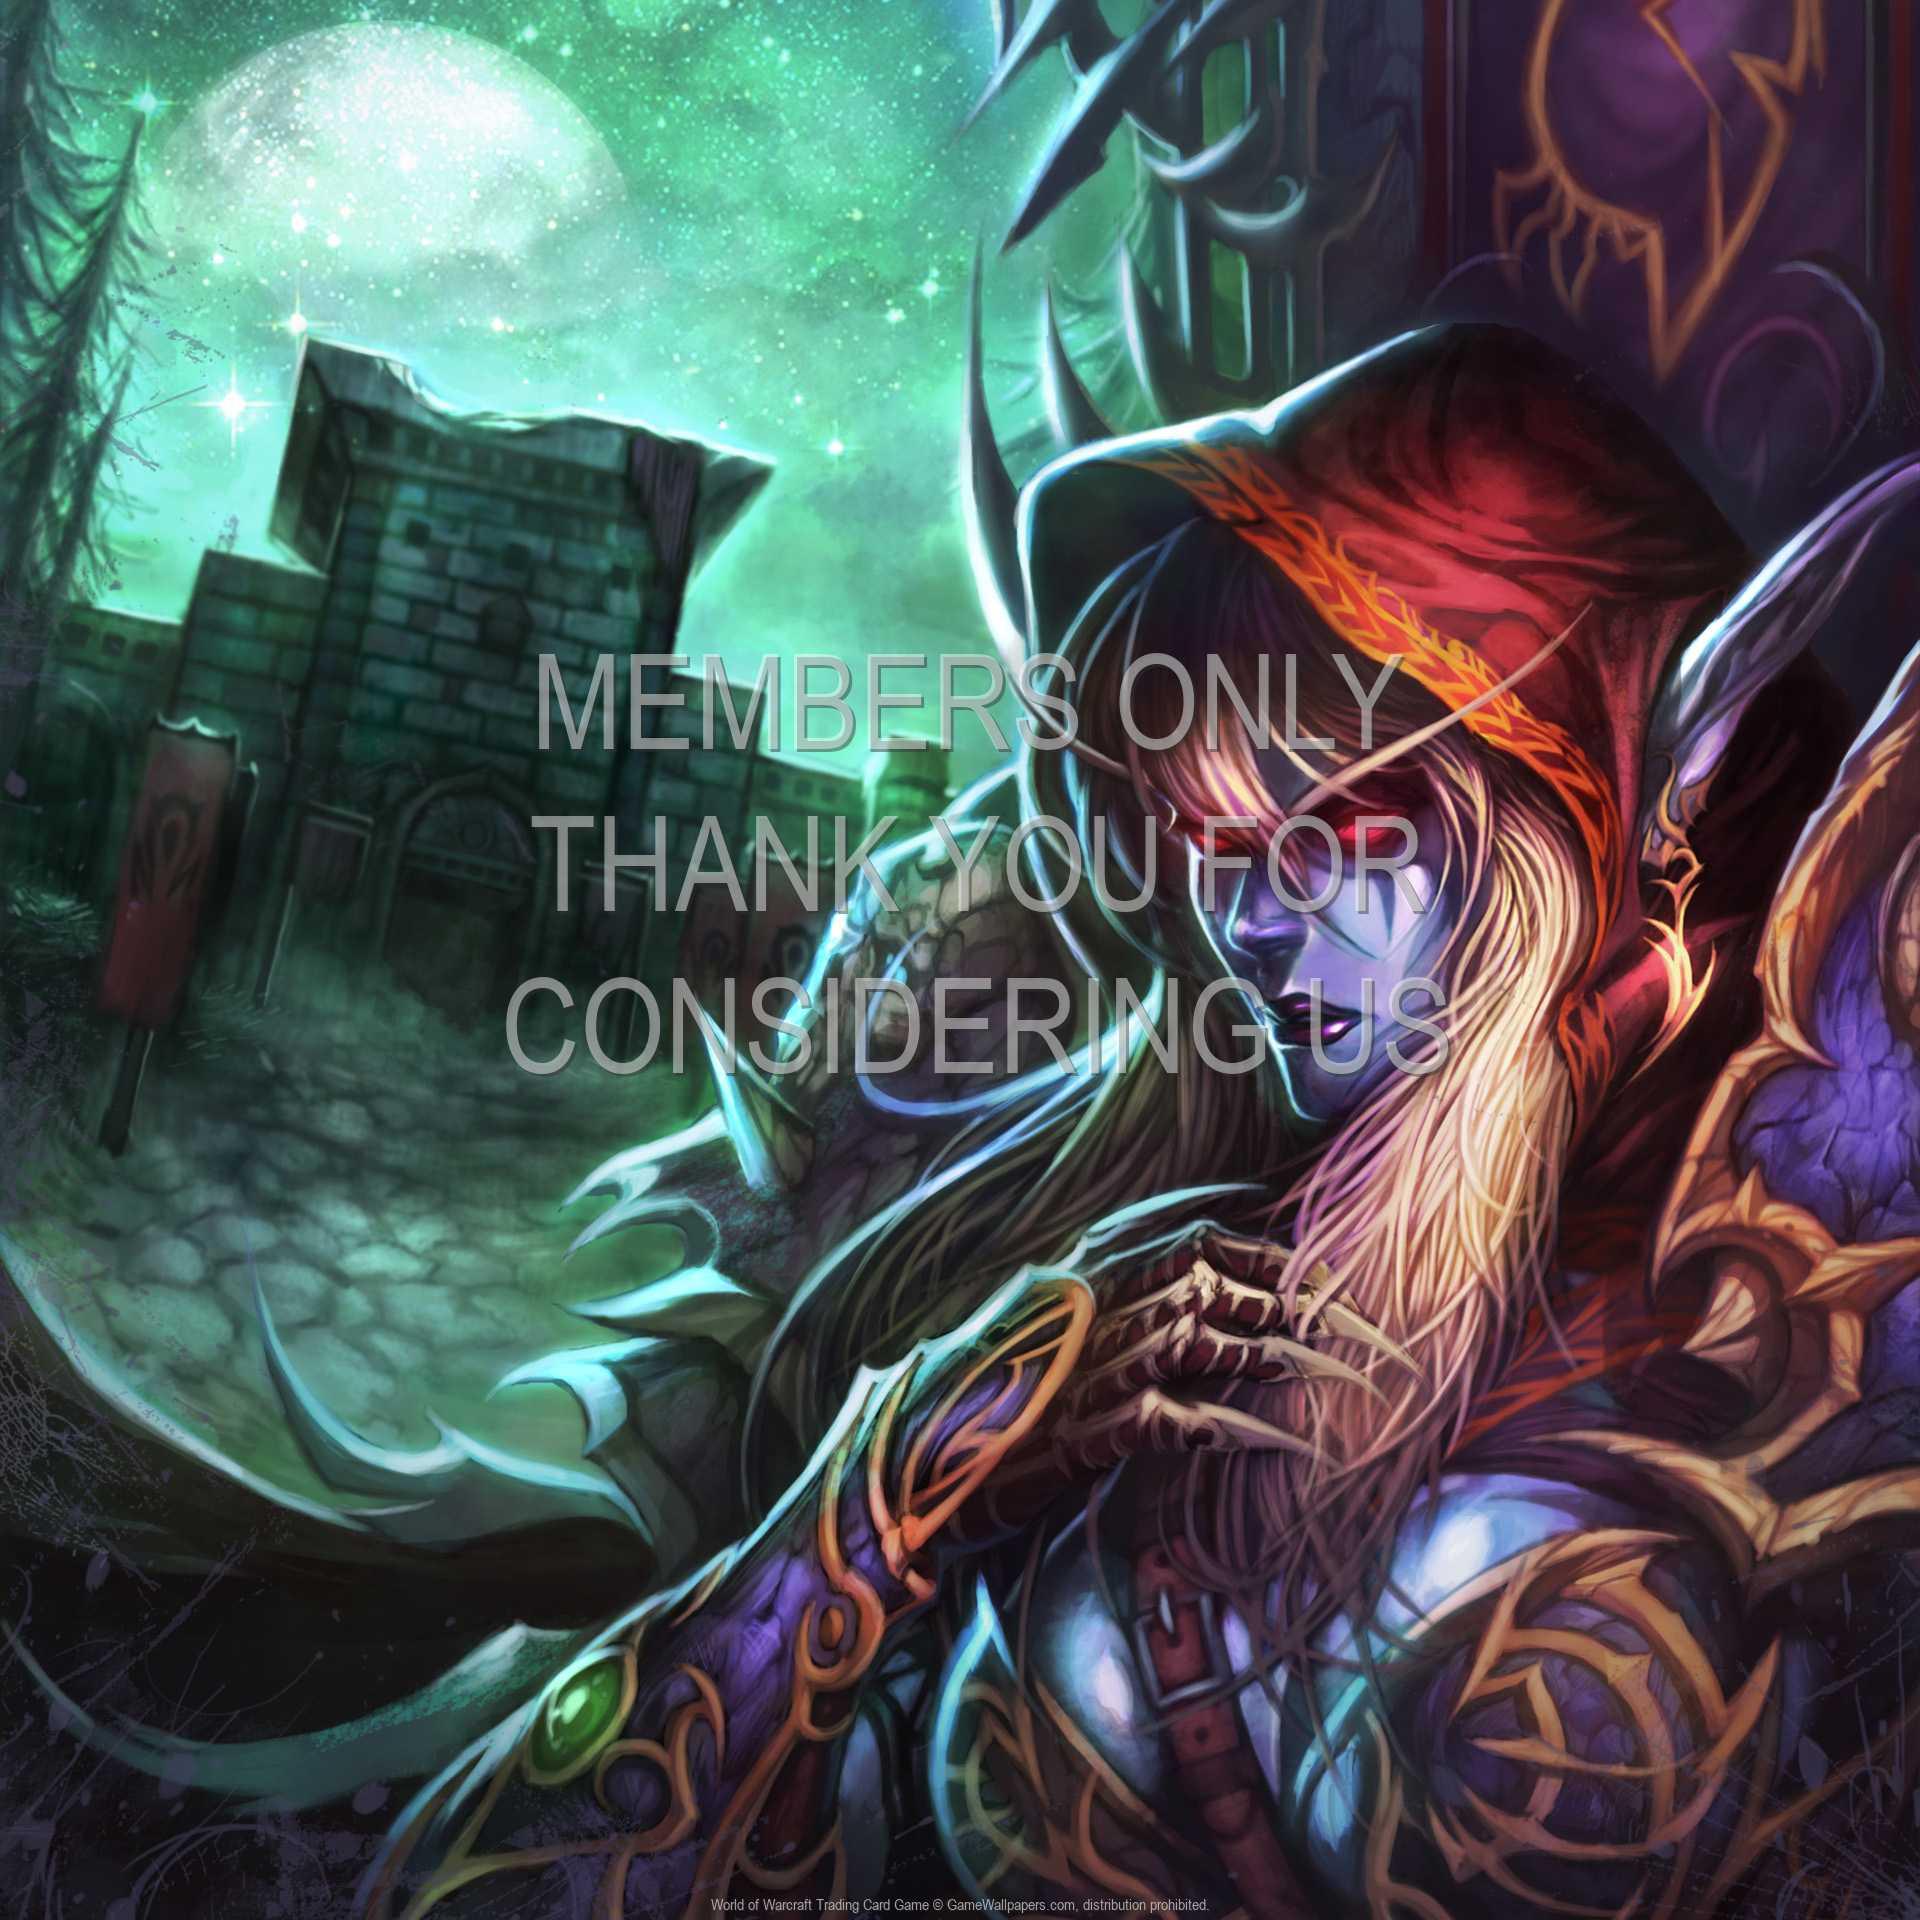 World of Warcraft: Trading Card Game 1080p Horizontal Handy Hintergrundbild 51